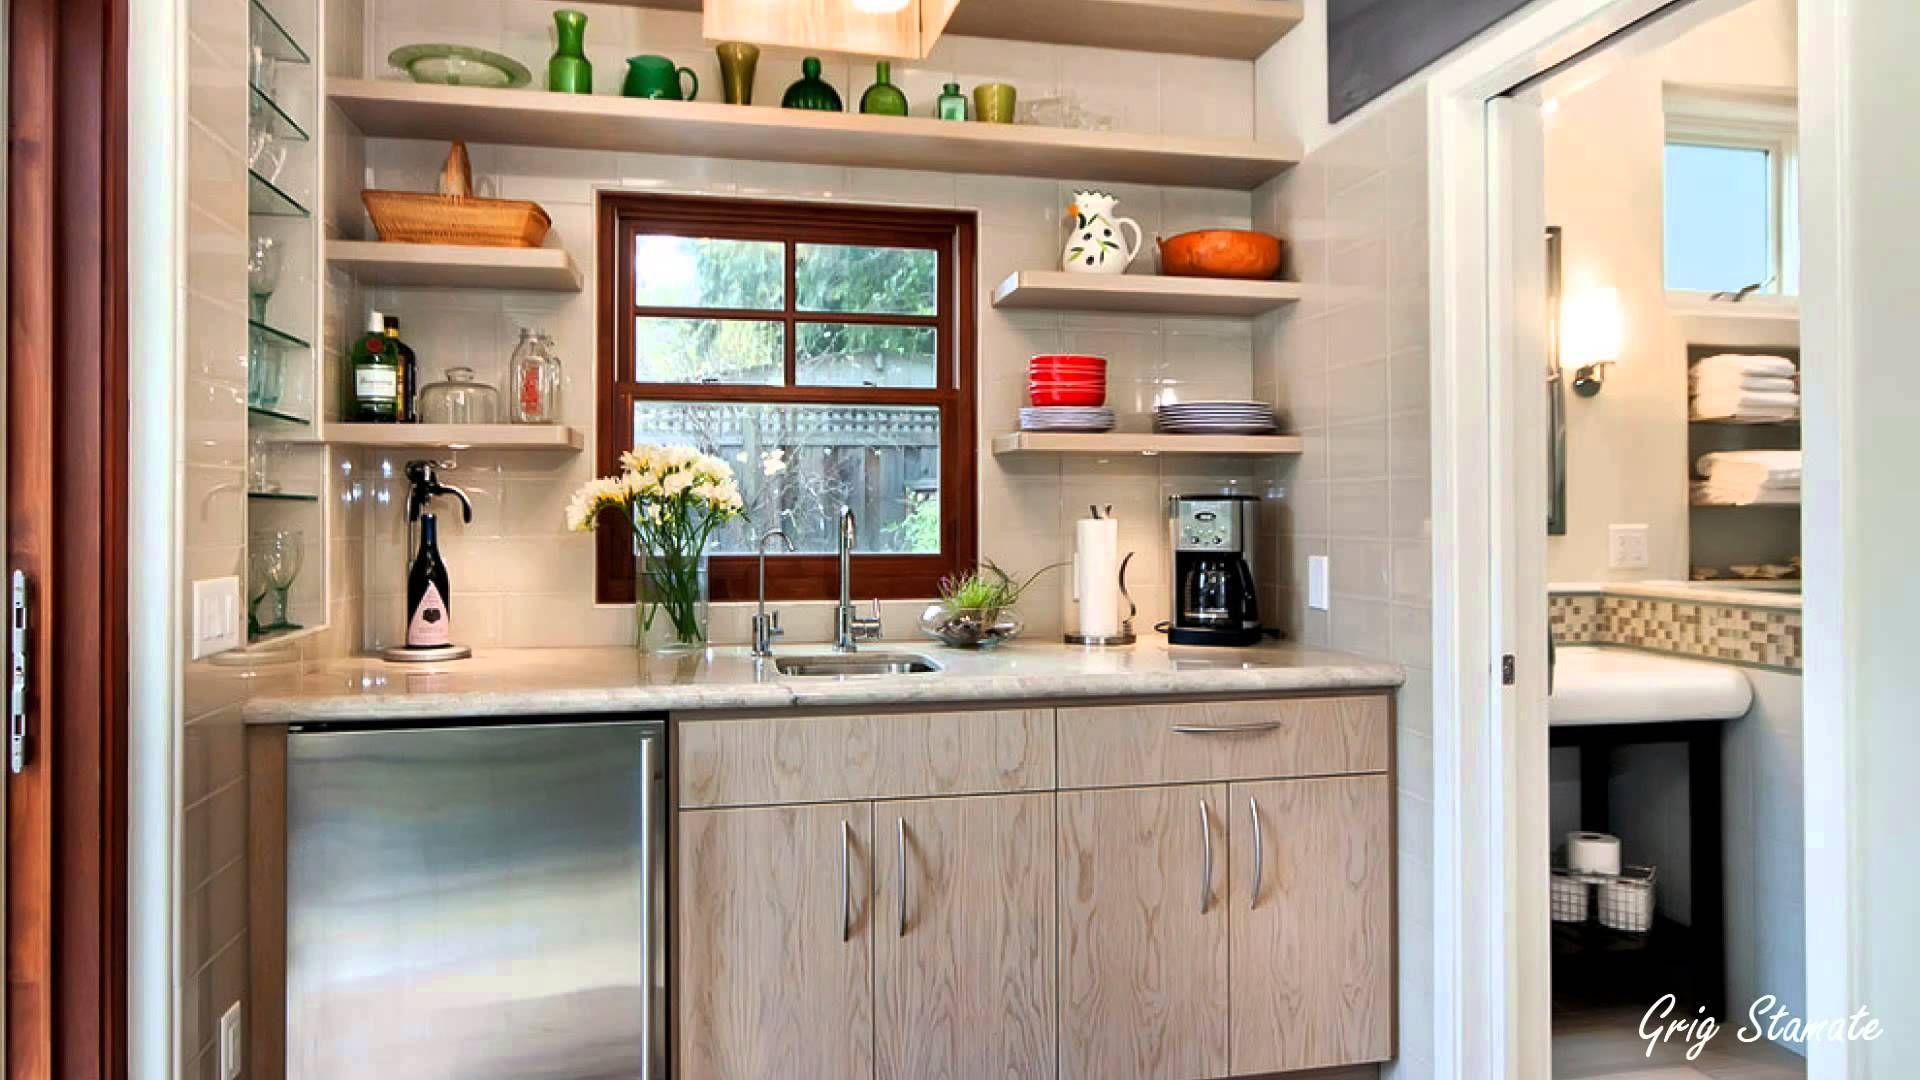 Tiny Home Smart Interior Design Ideas That Maximize Space | Tiny ...